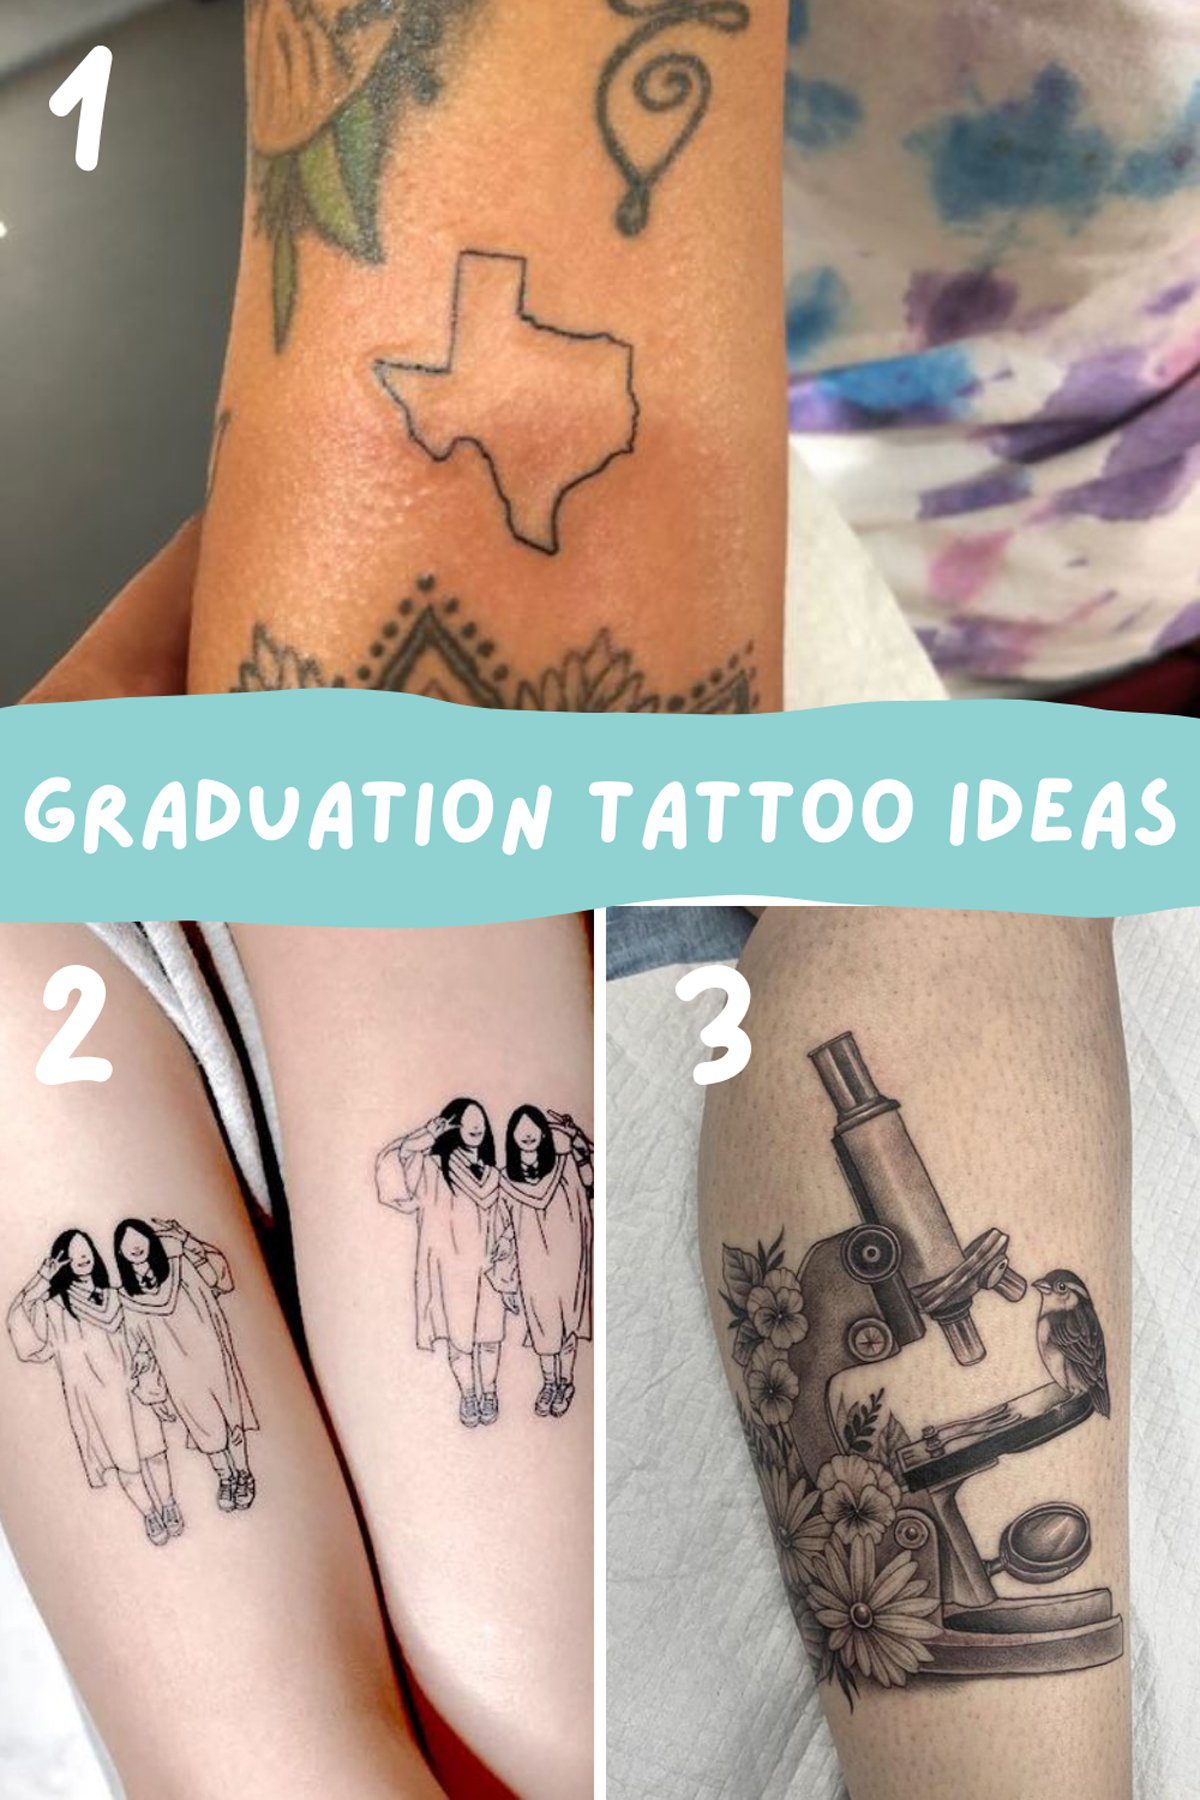 New Beginning Tattoo ideas for grads